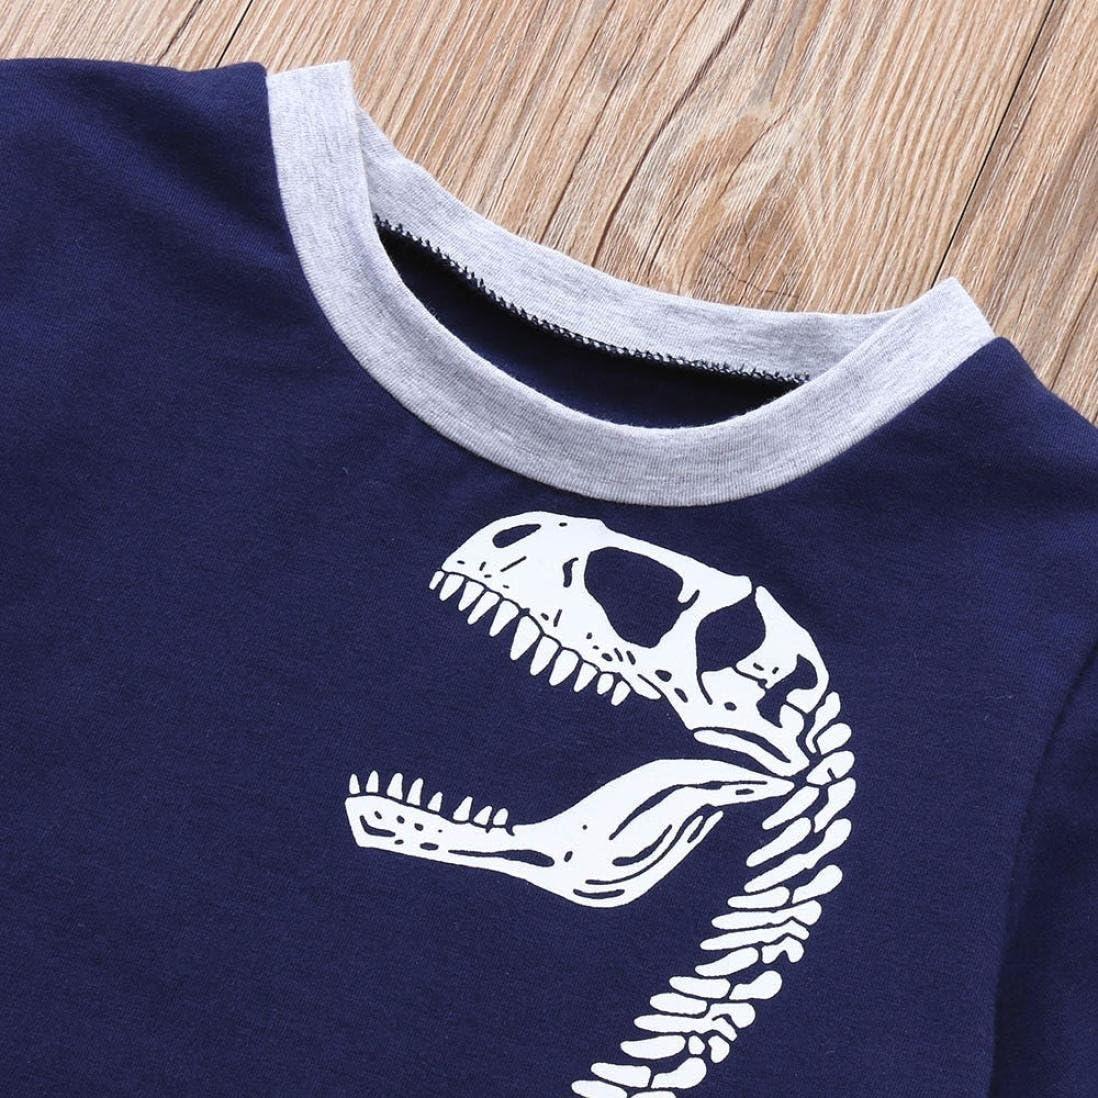 ◕‿◕ LMMVP 2 Pcs Enfants B/éb/é Gar/çons Dinosaure Imprimer /À Manches Courtes Tops Shorts Tenues V/êtements Ensembles